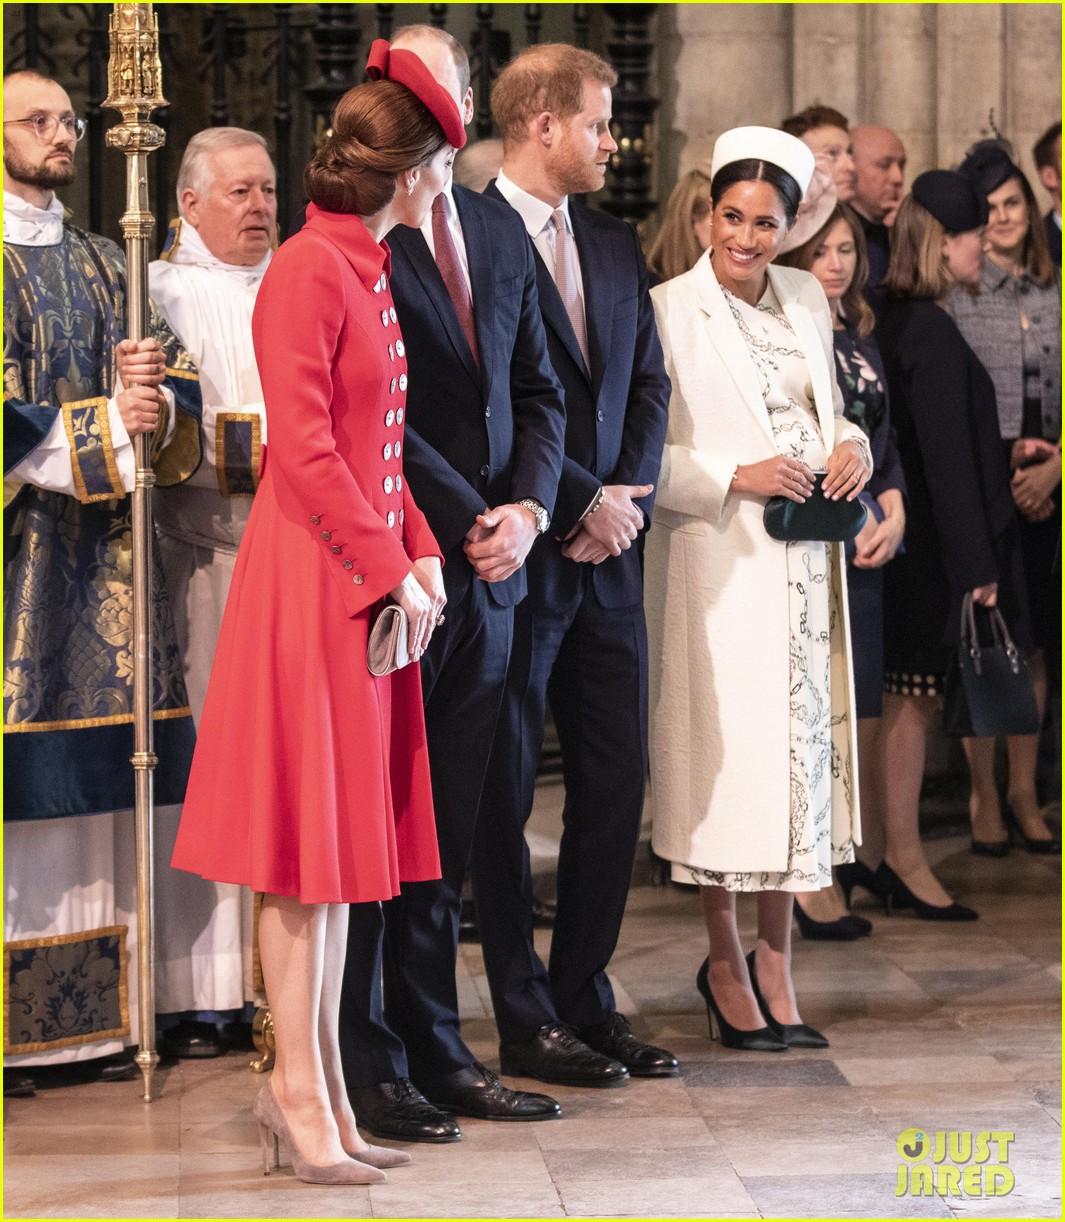 Kate Middleton & Meghan Markle Look Friendly, Greet Each